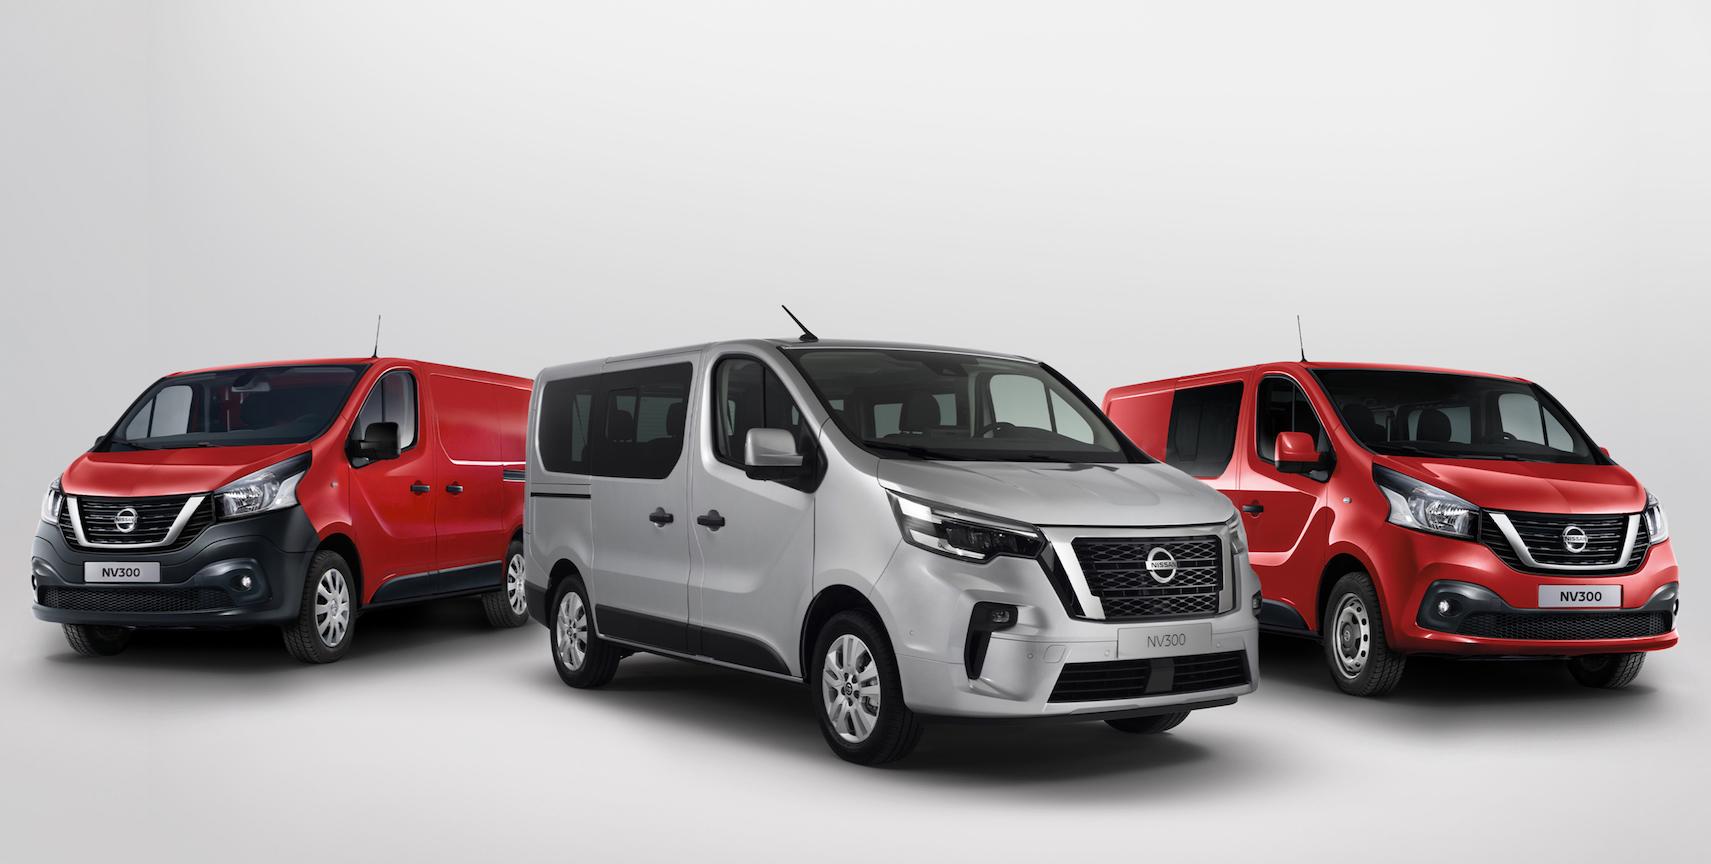 gama do Nissan NV300